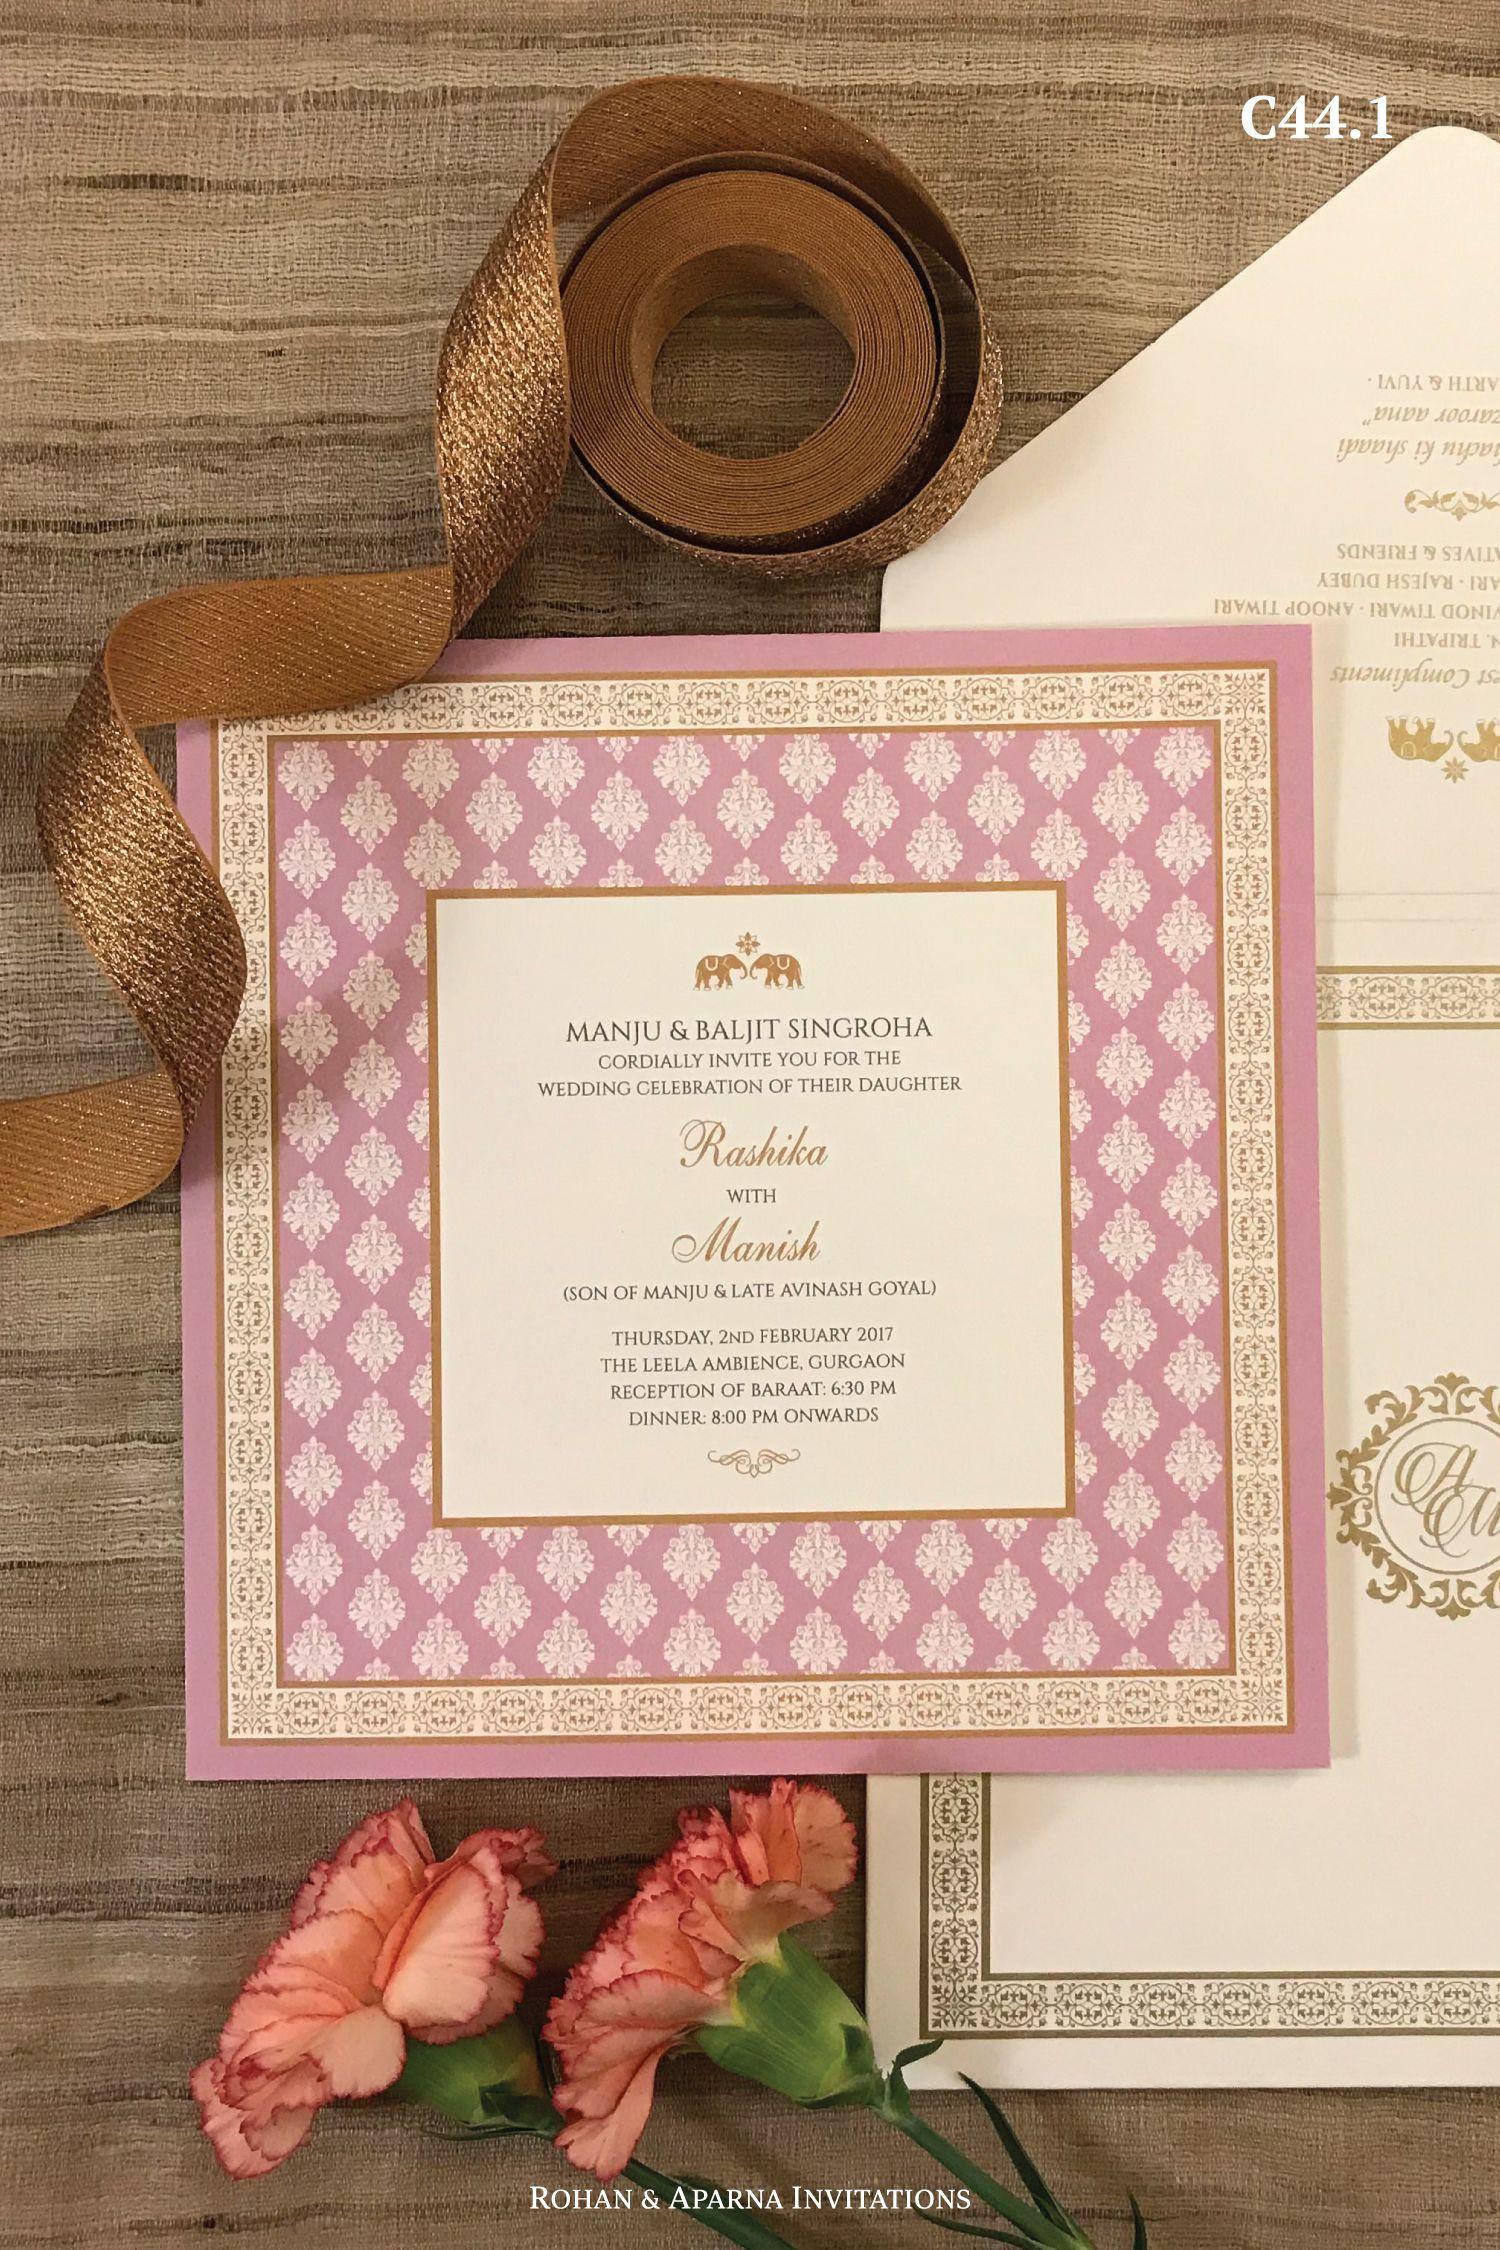 Buti pattern themed wedding invitation in pastel purple. For more design ideas, visit www.rohanaparna.com  ——————————————— #rohanaparnainvitations #invitations #weddinginvitations #weddingcard #uniqueinvitations #weddingcards #uniqueweddinginvitations #weddingstationery #hinduweddingcards #weddingphotography #indianwedding #invitationideas #indianweddingcards #destinationwedding #weddingcards #wedding #butipattern #purple